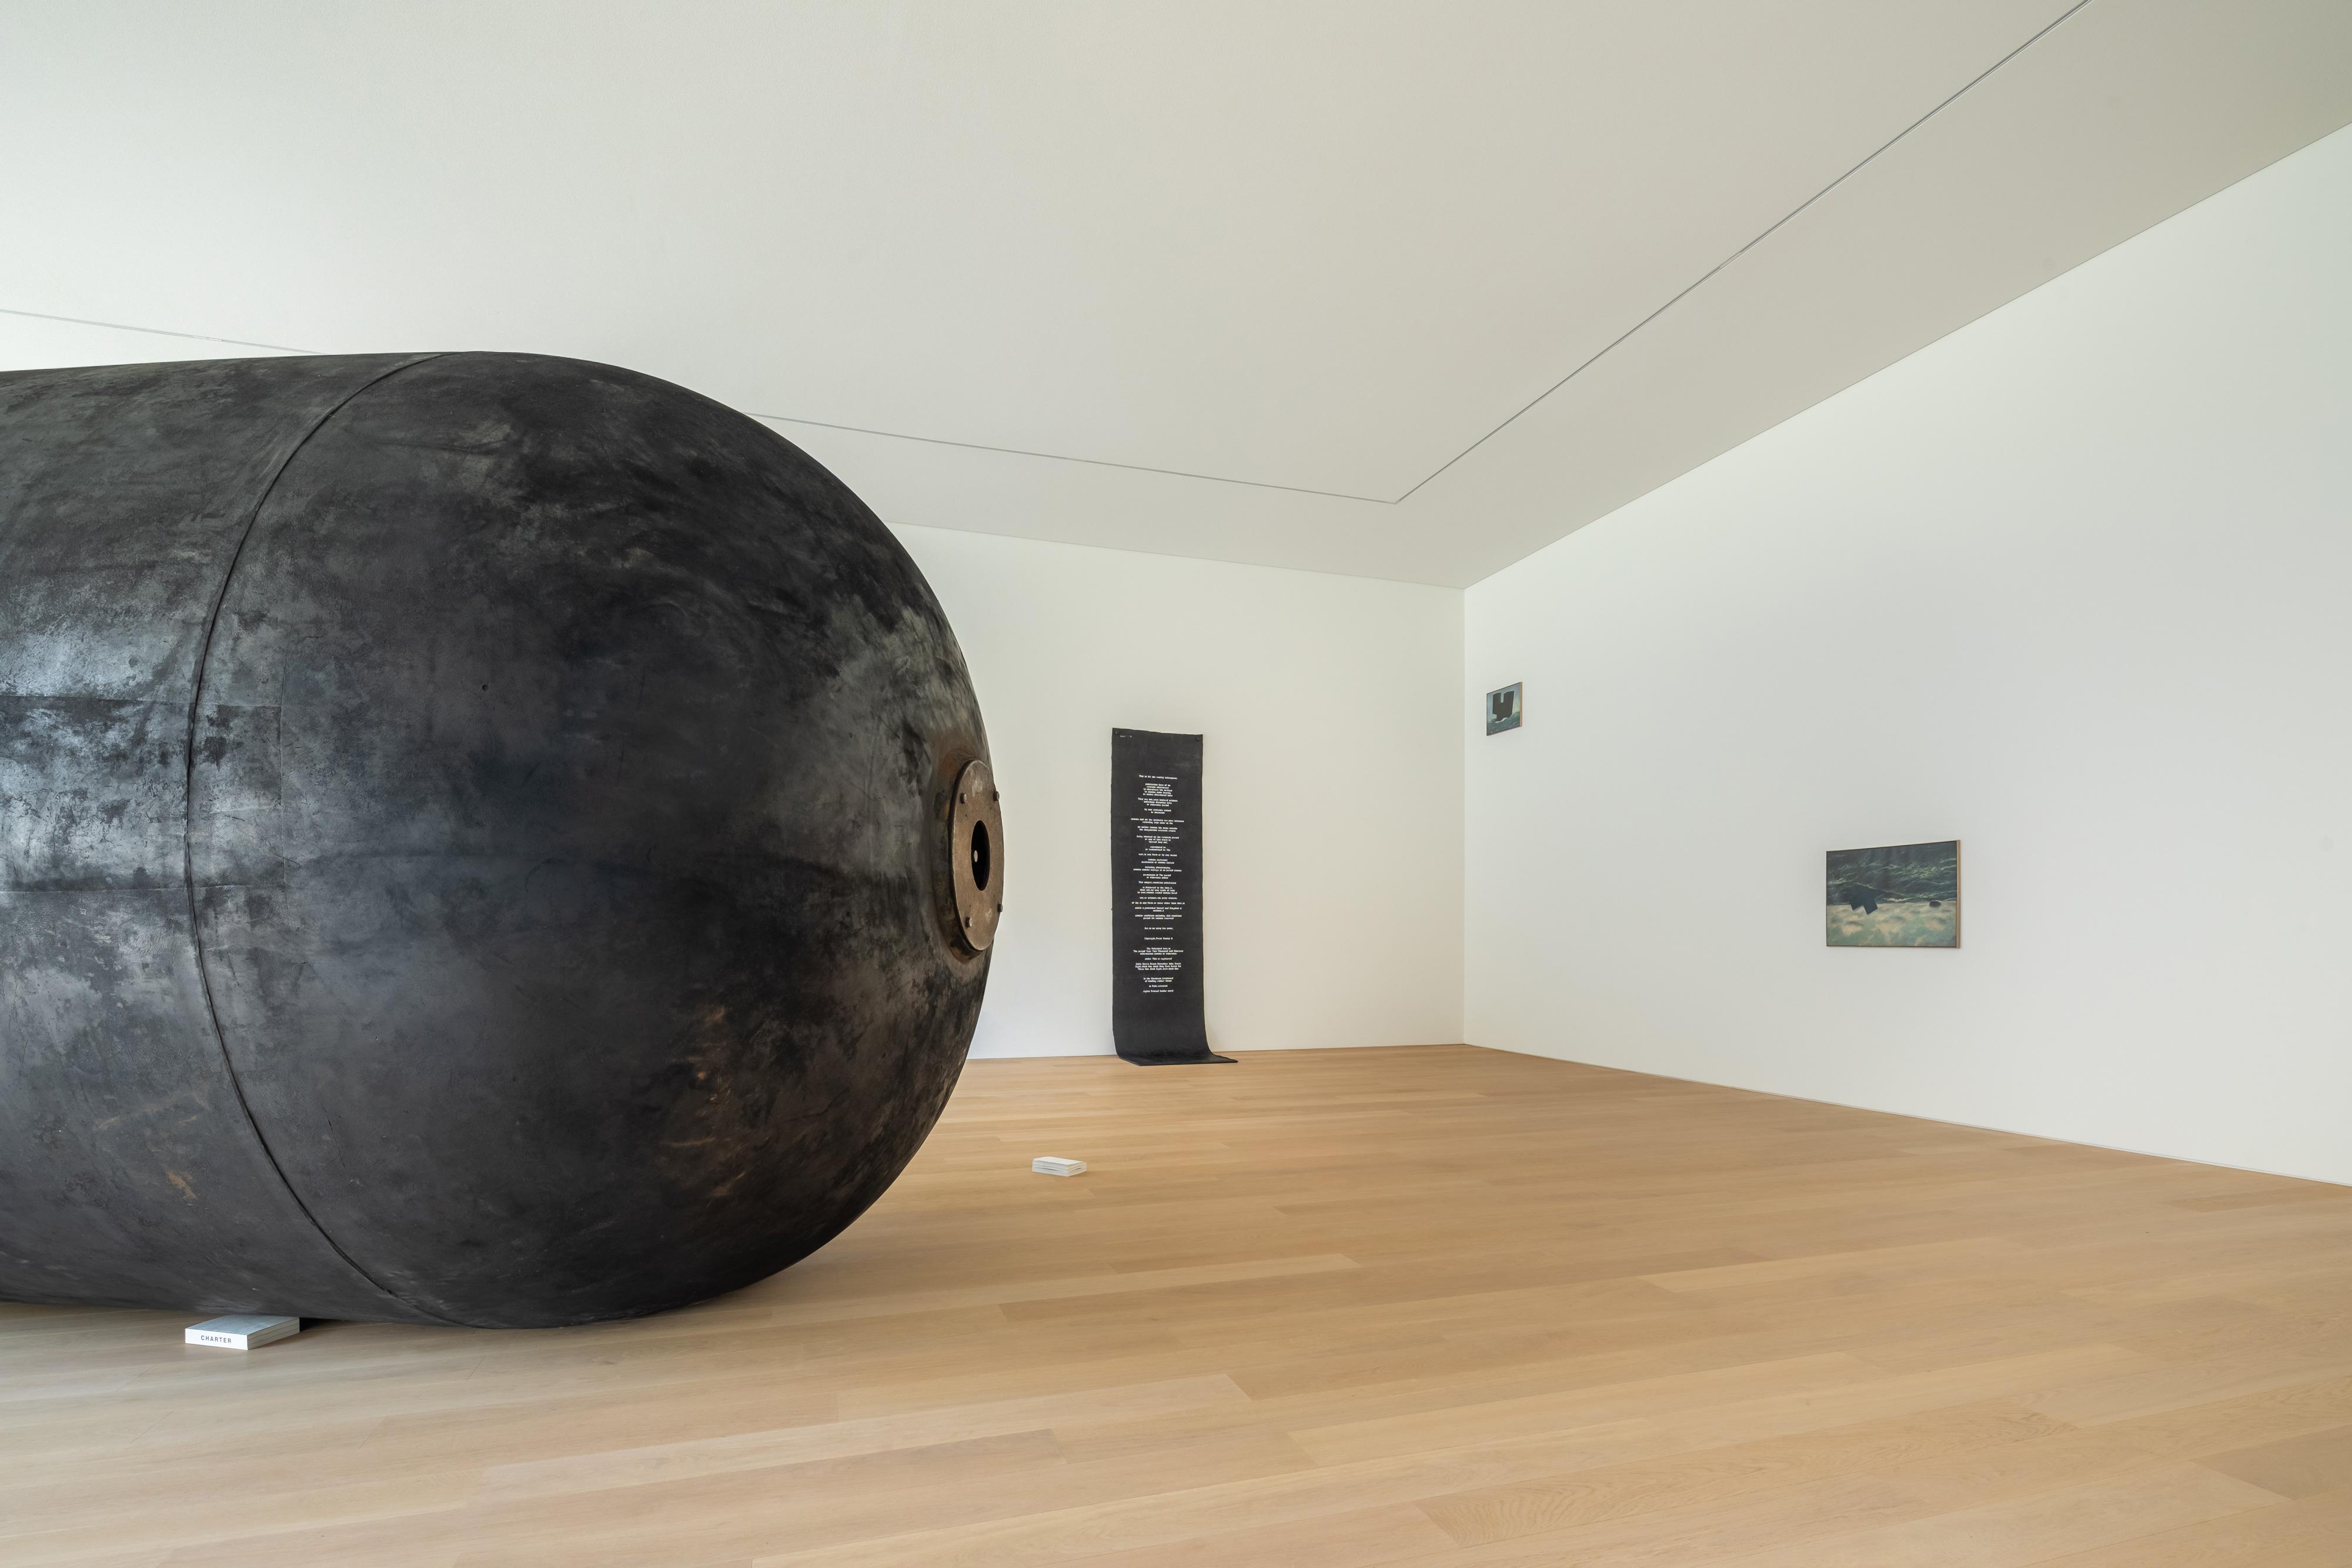 Galerie Barbara Thumm \ Fiona Banner aka The Vanity Press – P E R I O D